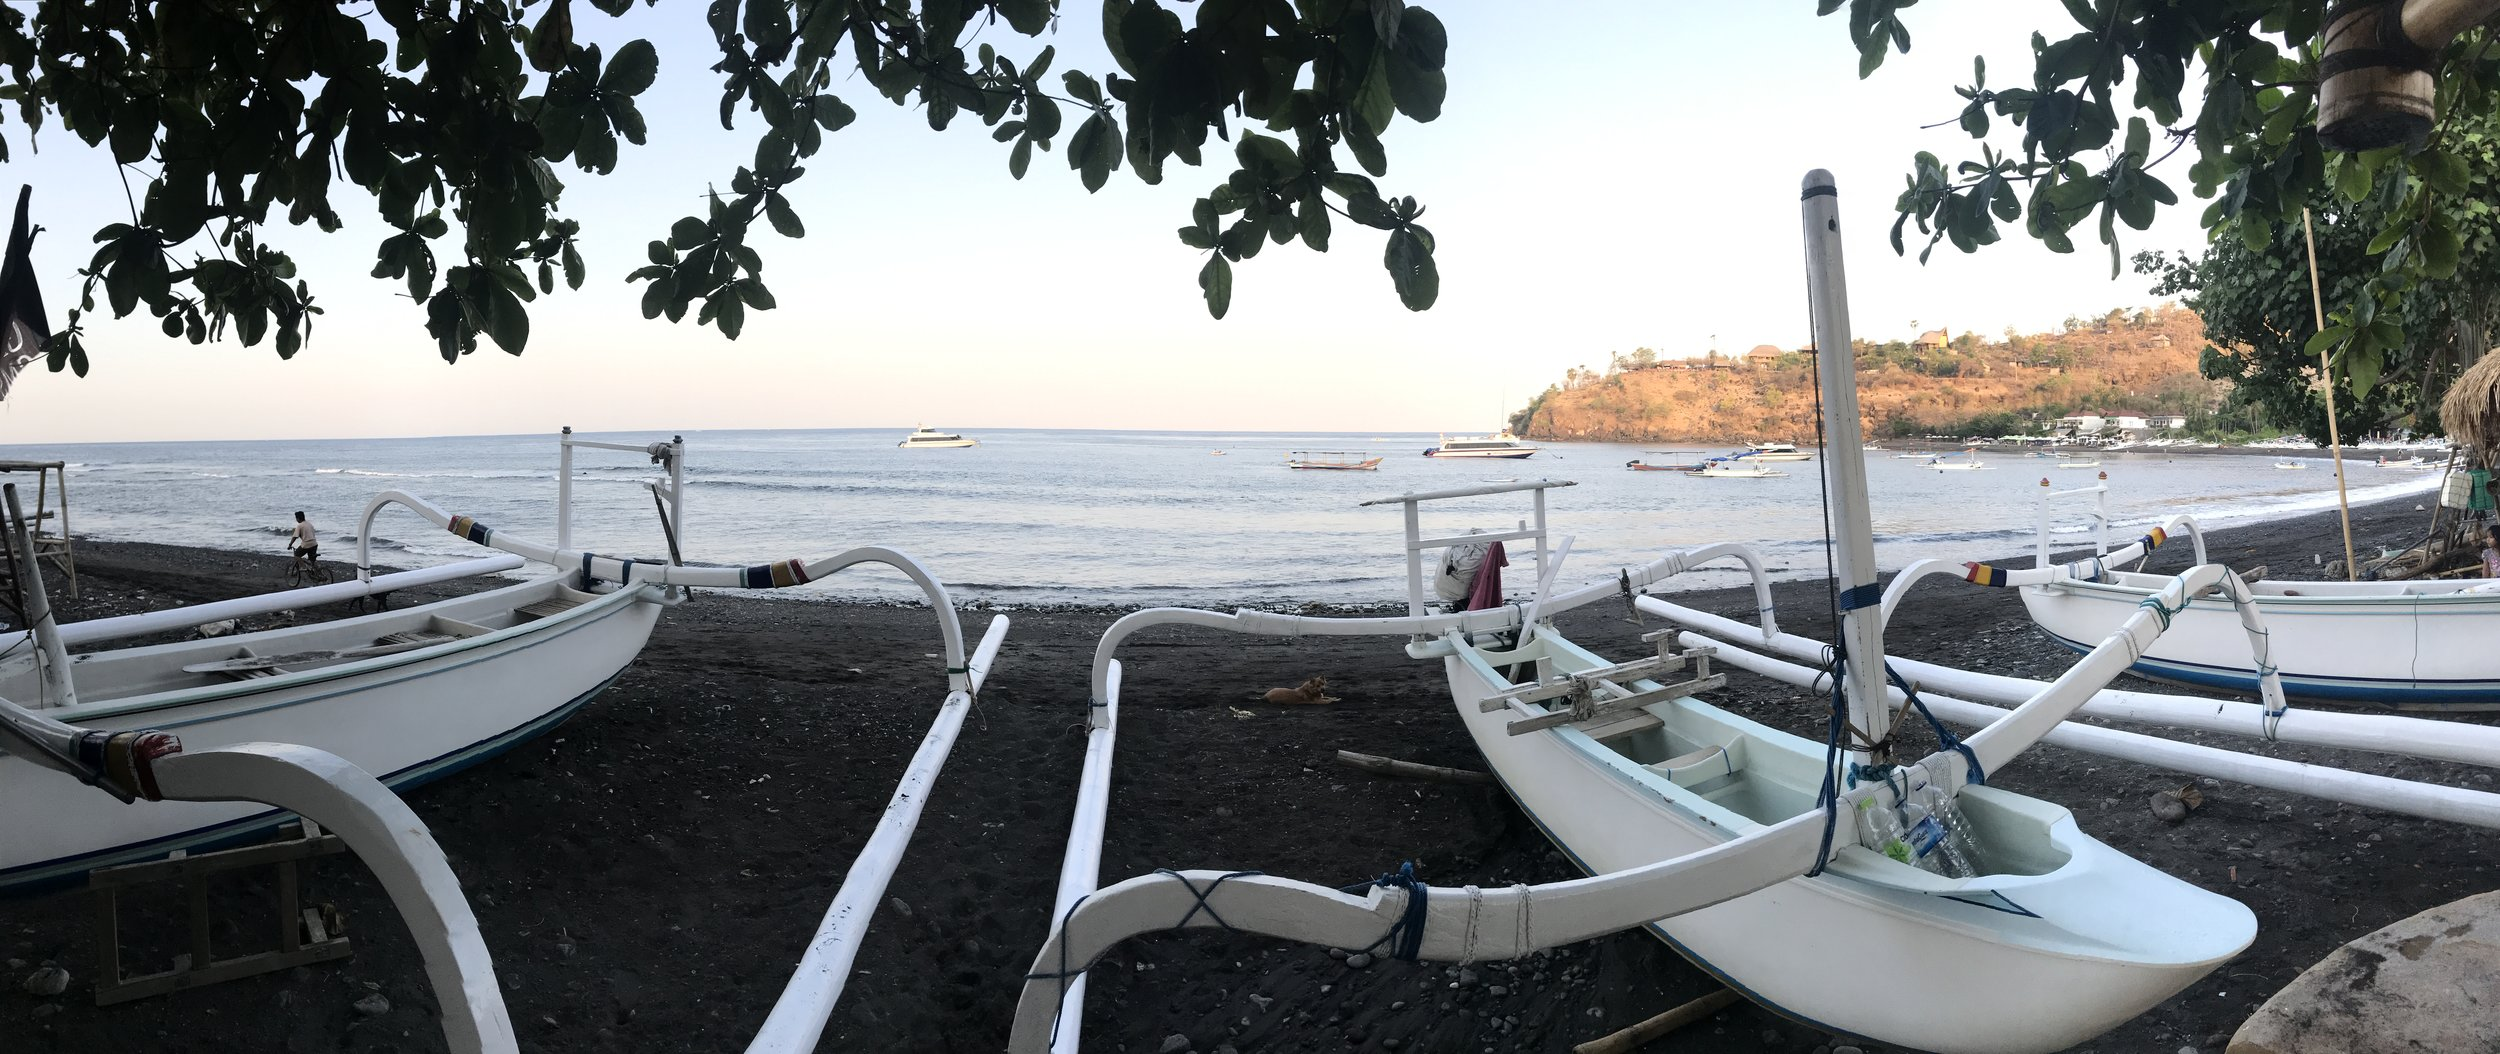 Freediving Apneista Bali